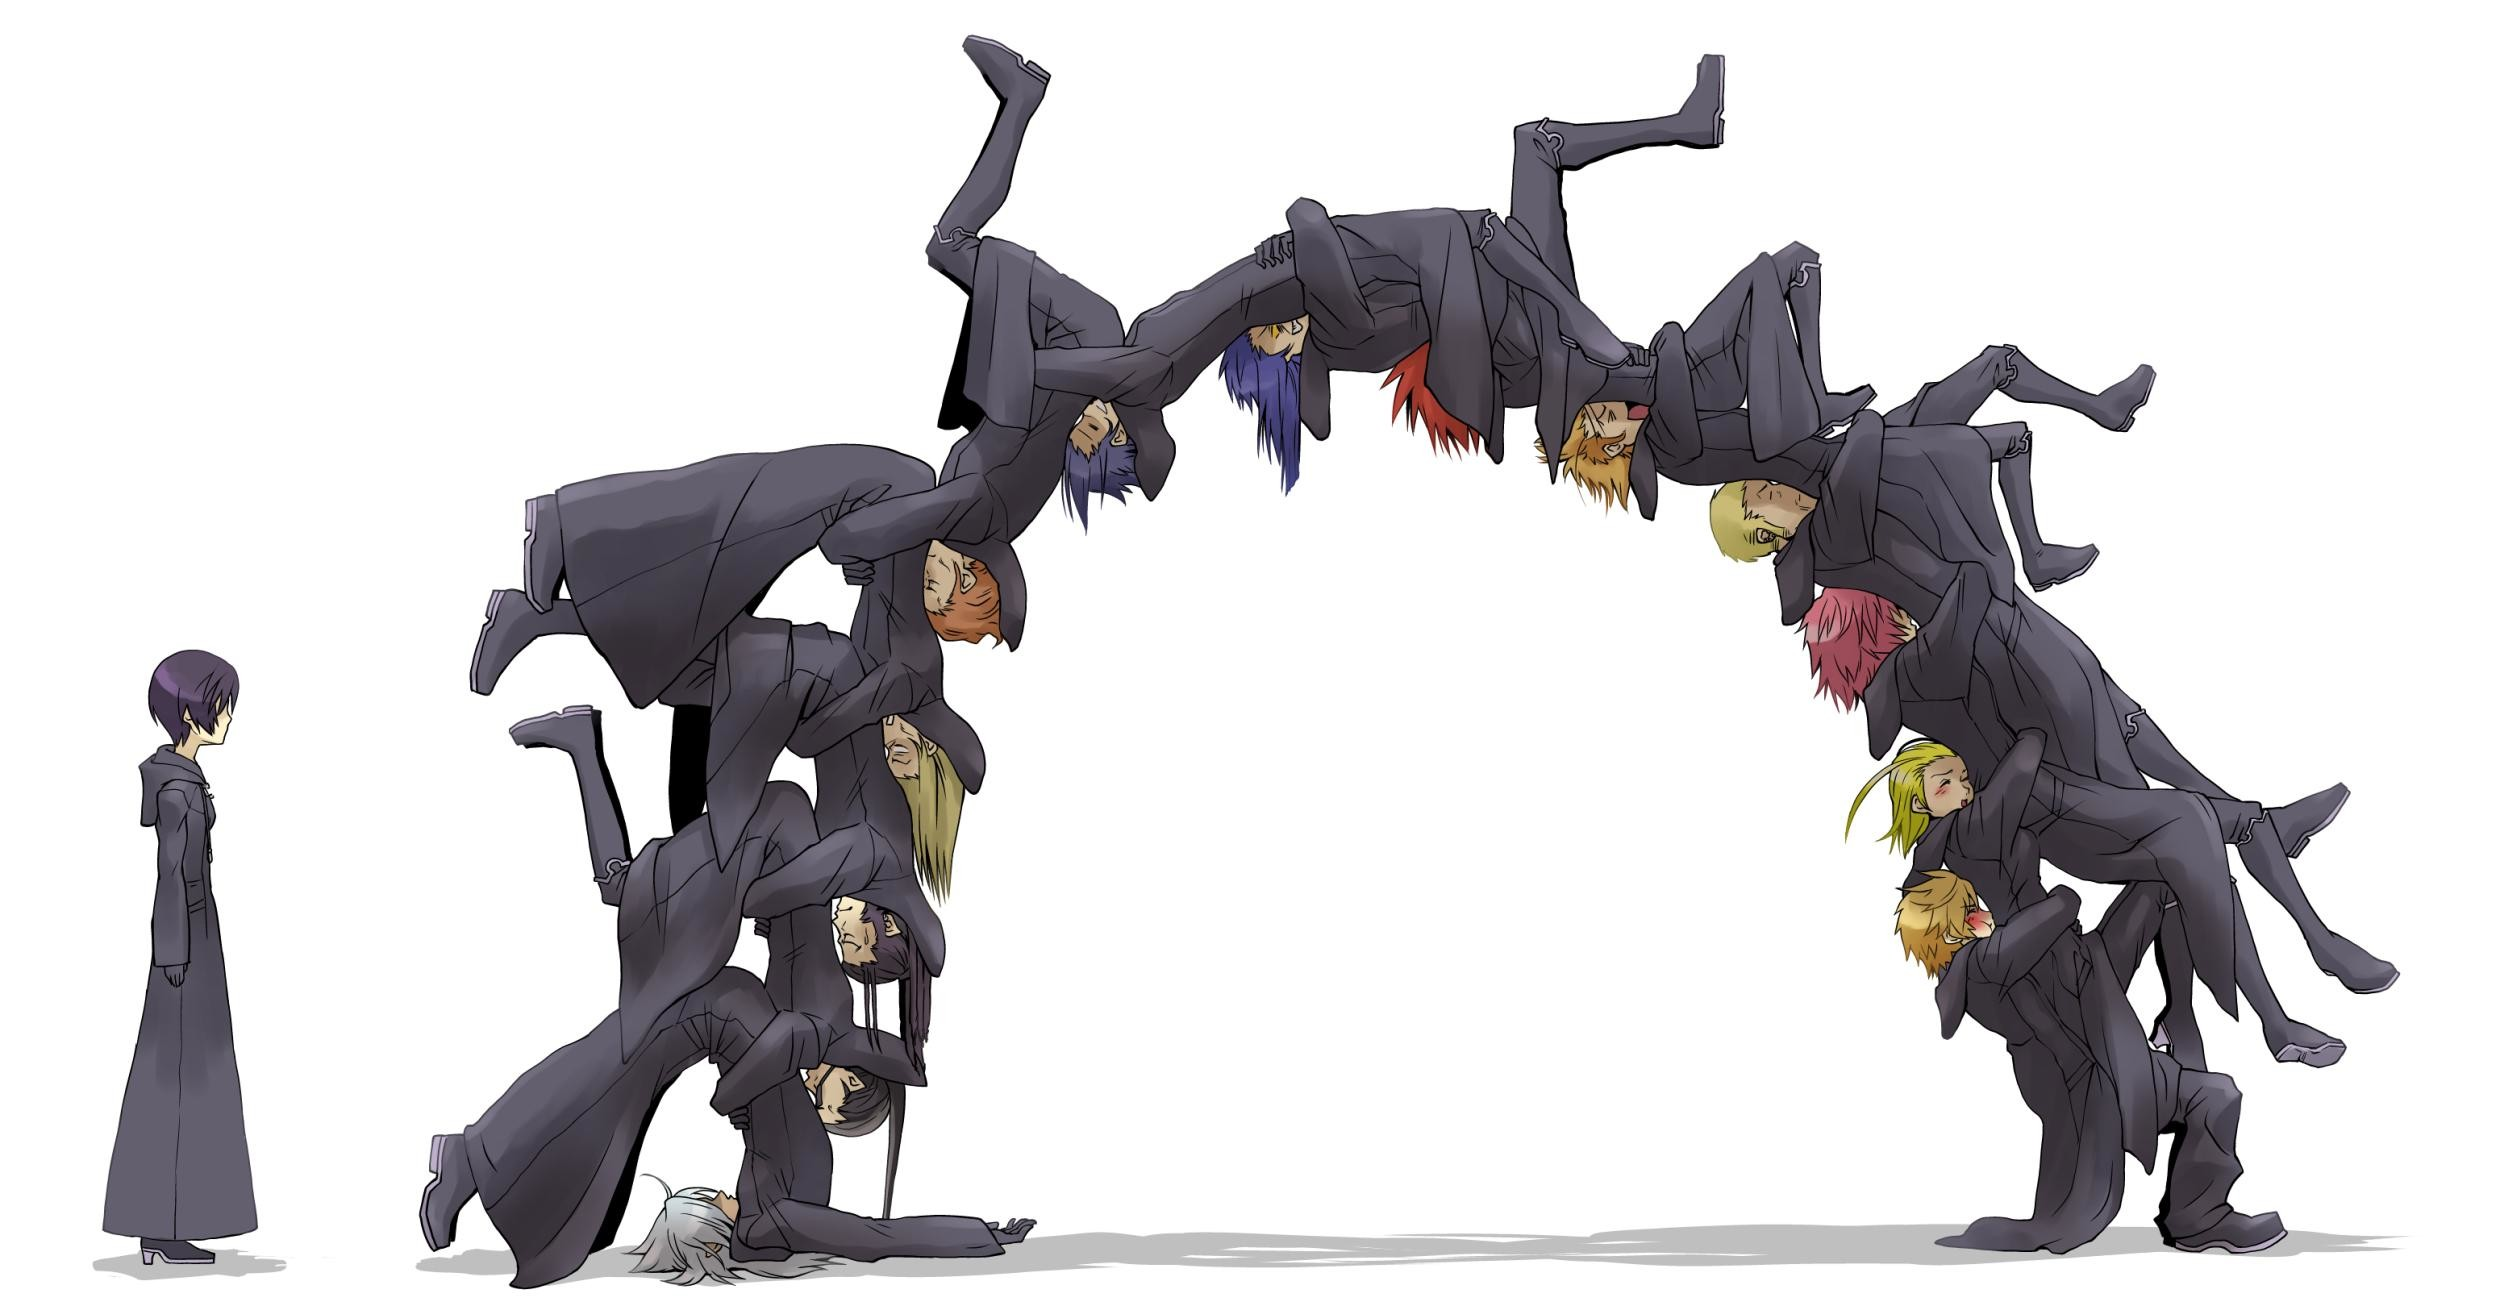 Kingdom Hearts Roxas Wallpapers High Quality Resolution